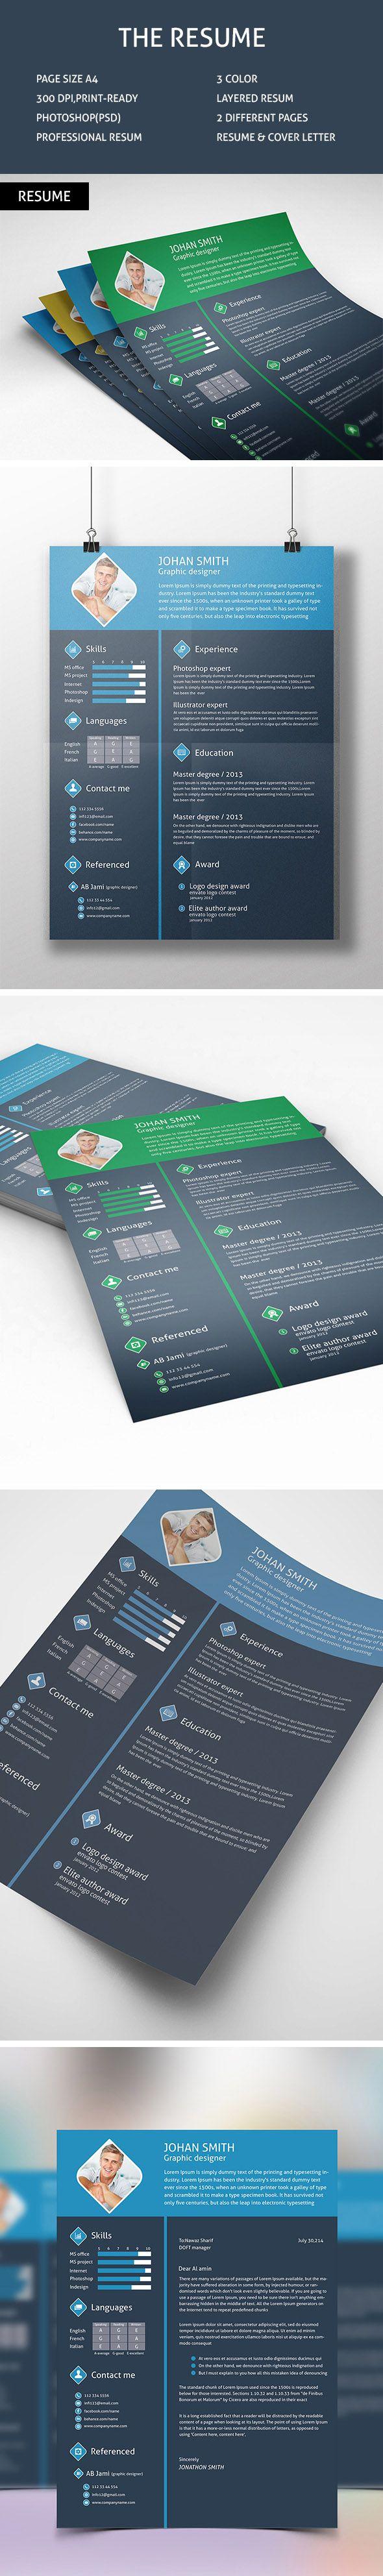 10 Best Free Premium Resume Design Templates Images On Pinterest